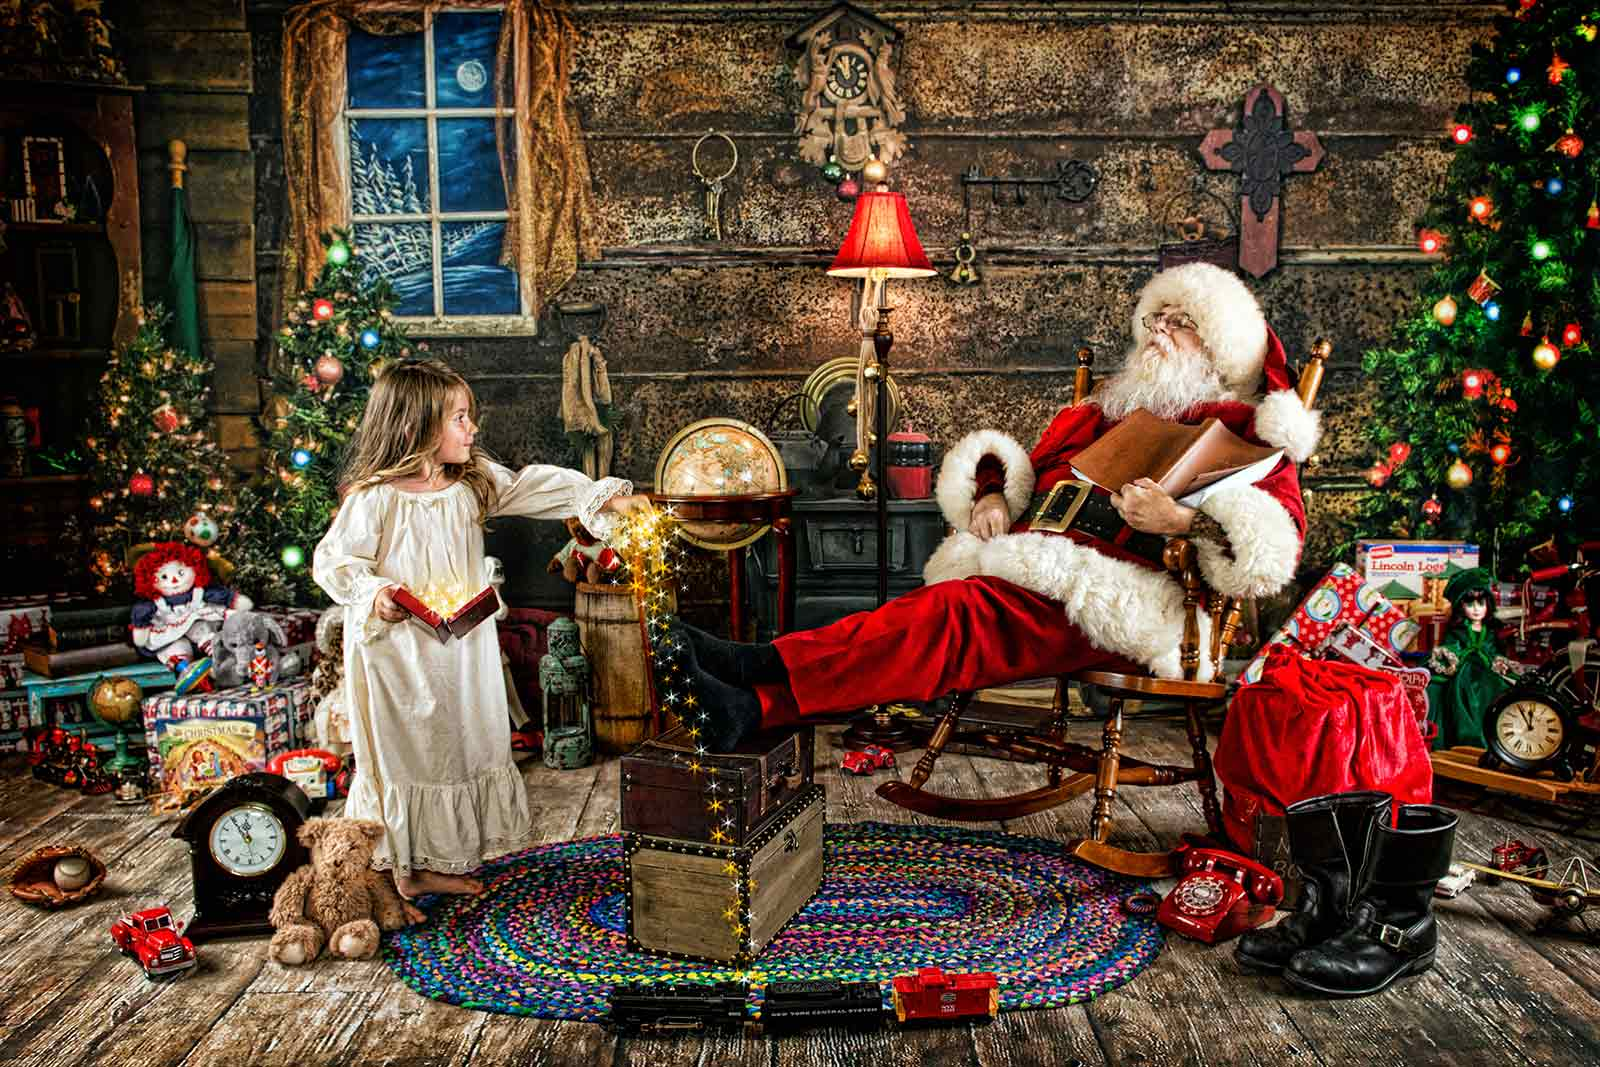 015_Magic-of-Santa-Anna-Thielen-Photography